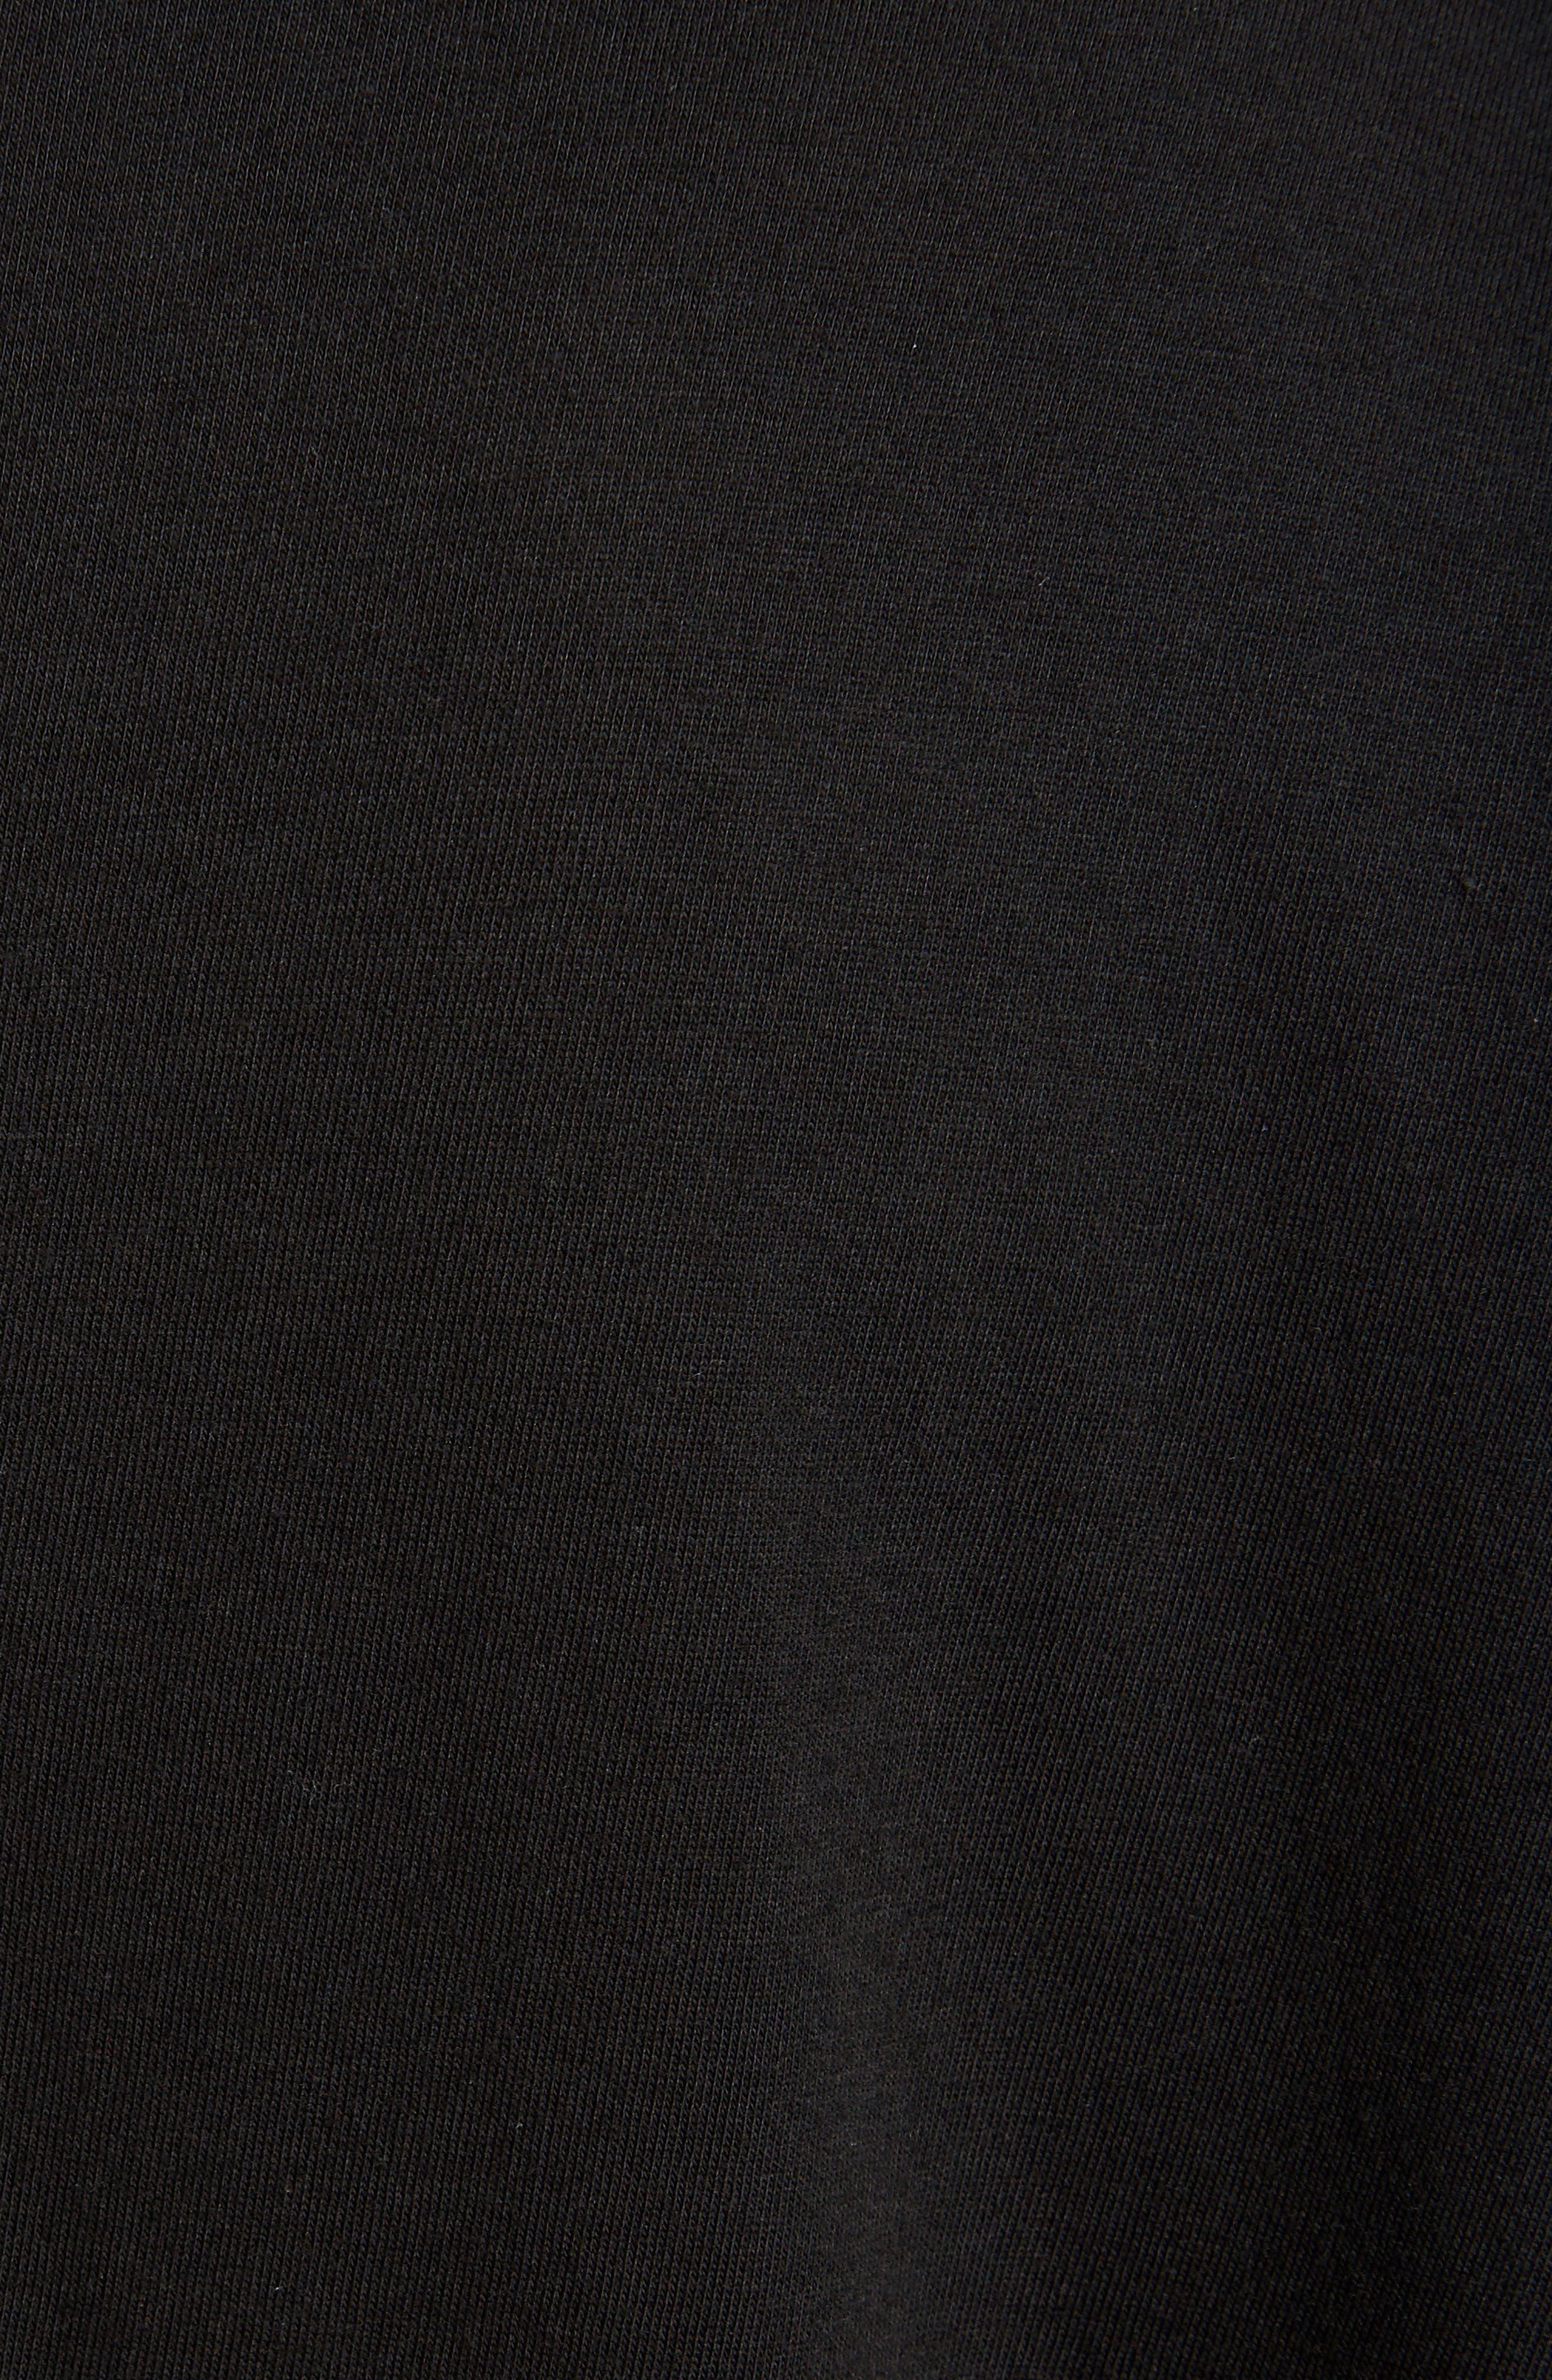 Sheer Hem T-Shirt Dress,                             Alternate thumbnail 5, color,                             001